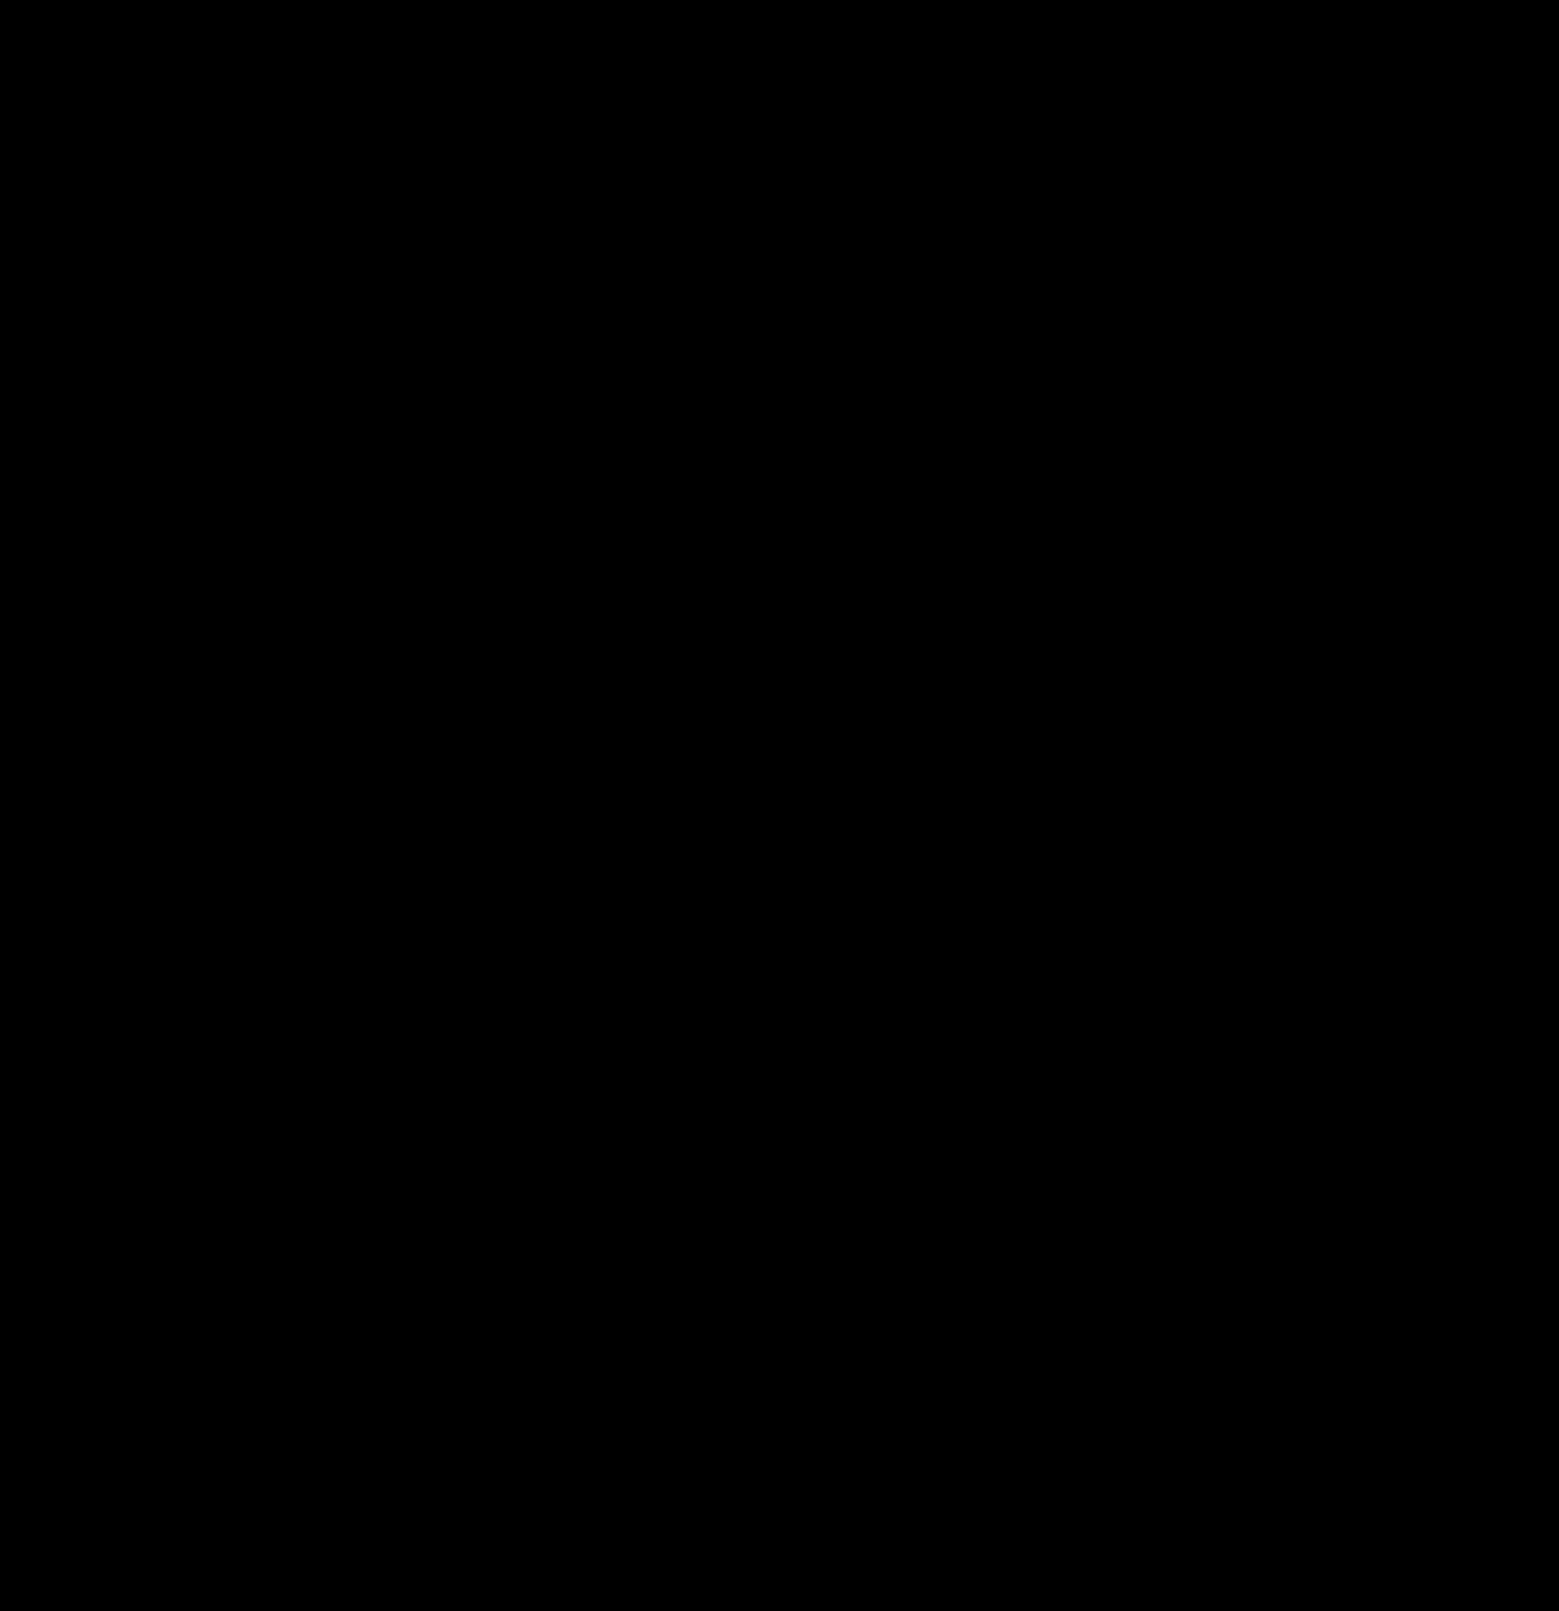 Free ukiyo-e illustration of Cheering man